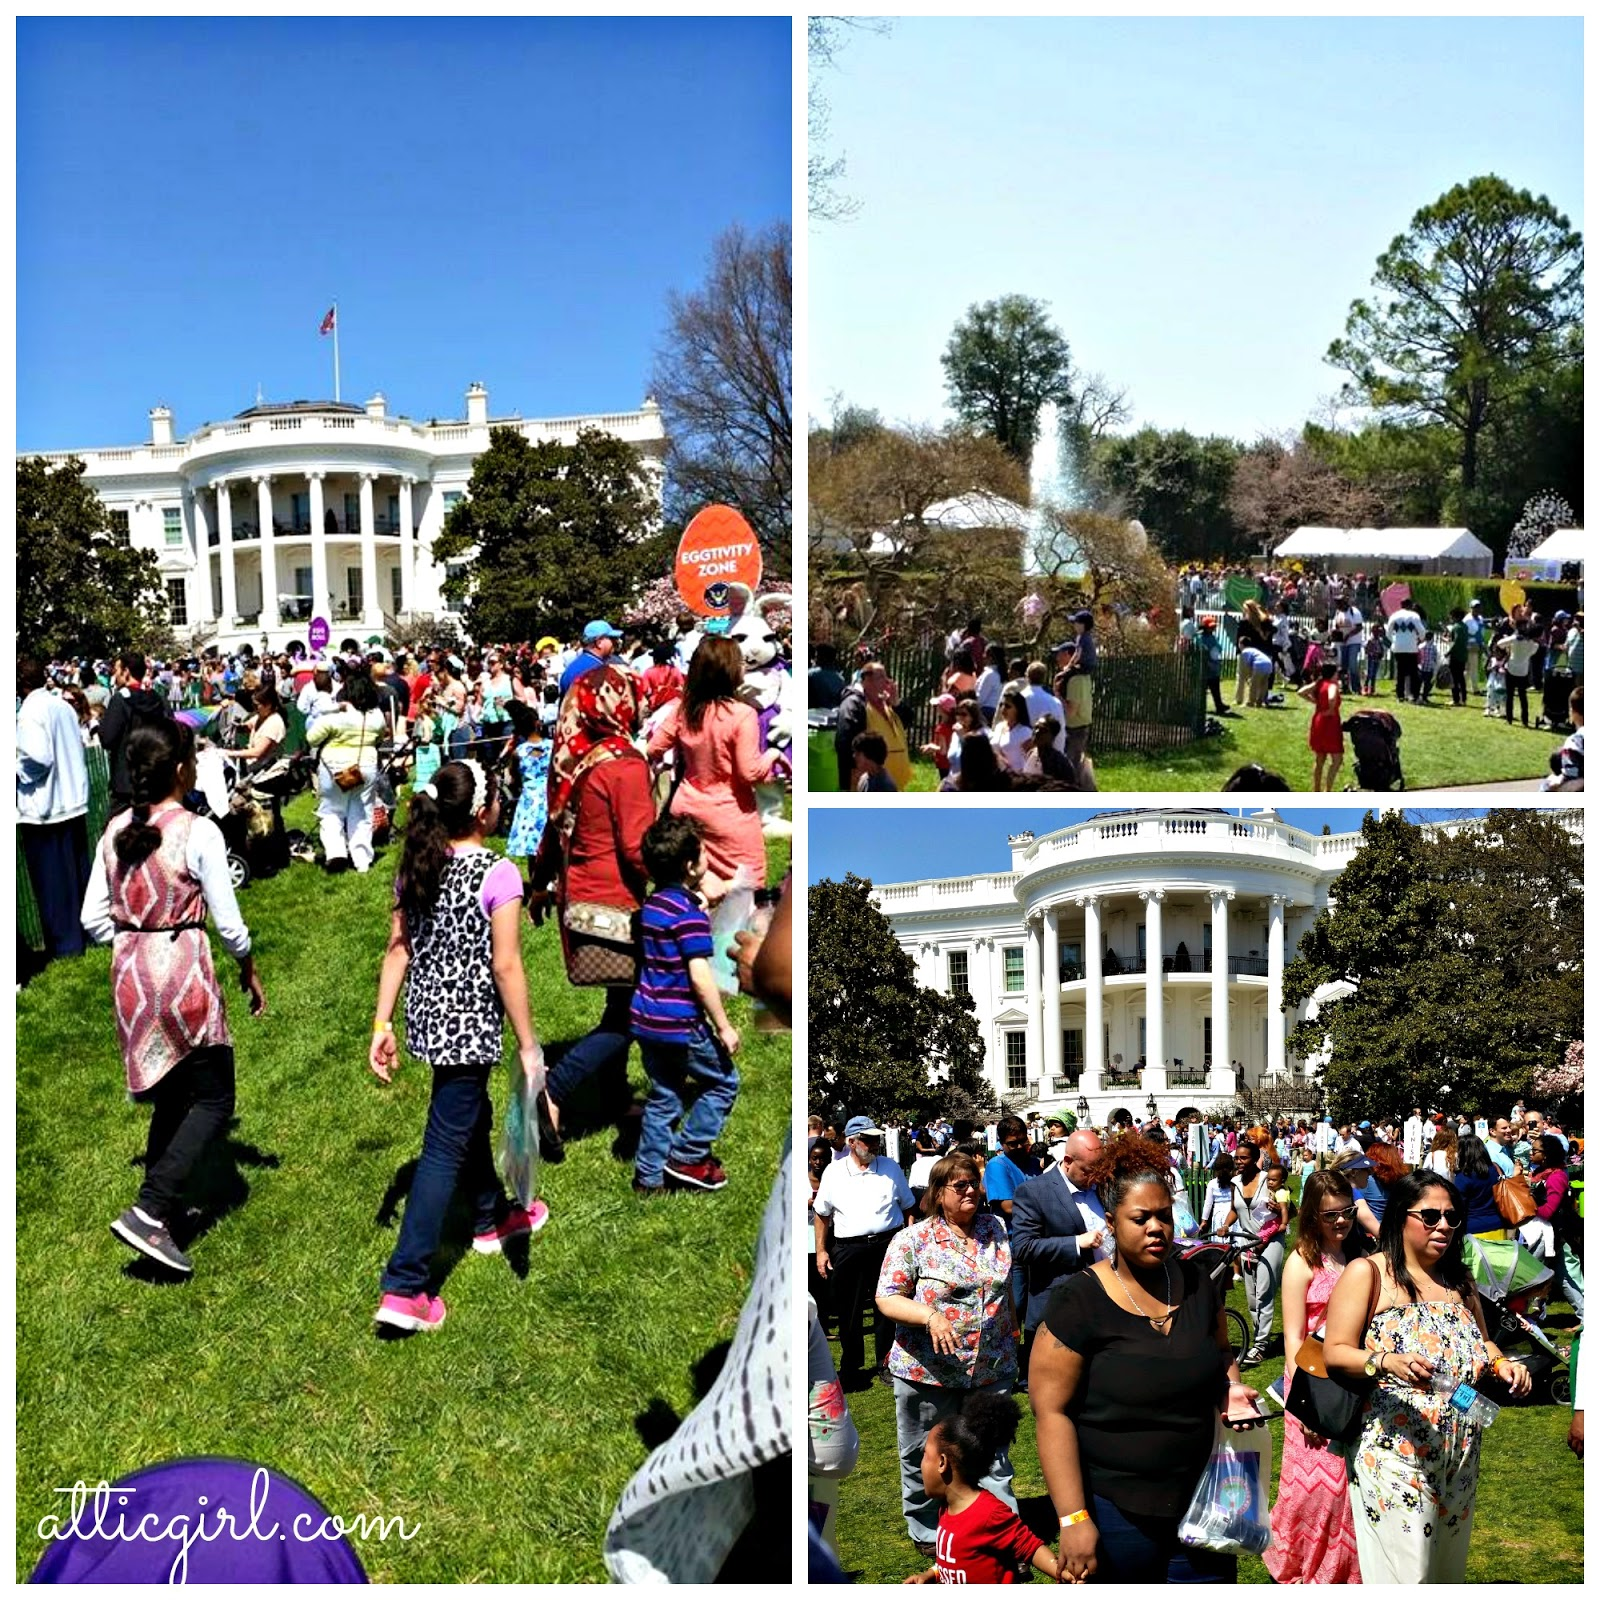 Easter Egg Roll 2015, Michelle Obama, President Obama, FLOTUS, POTUS, DC monuments, Tips for Visiting The White House Easter Egg Roll